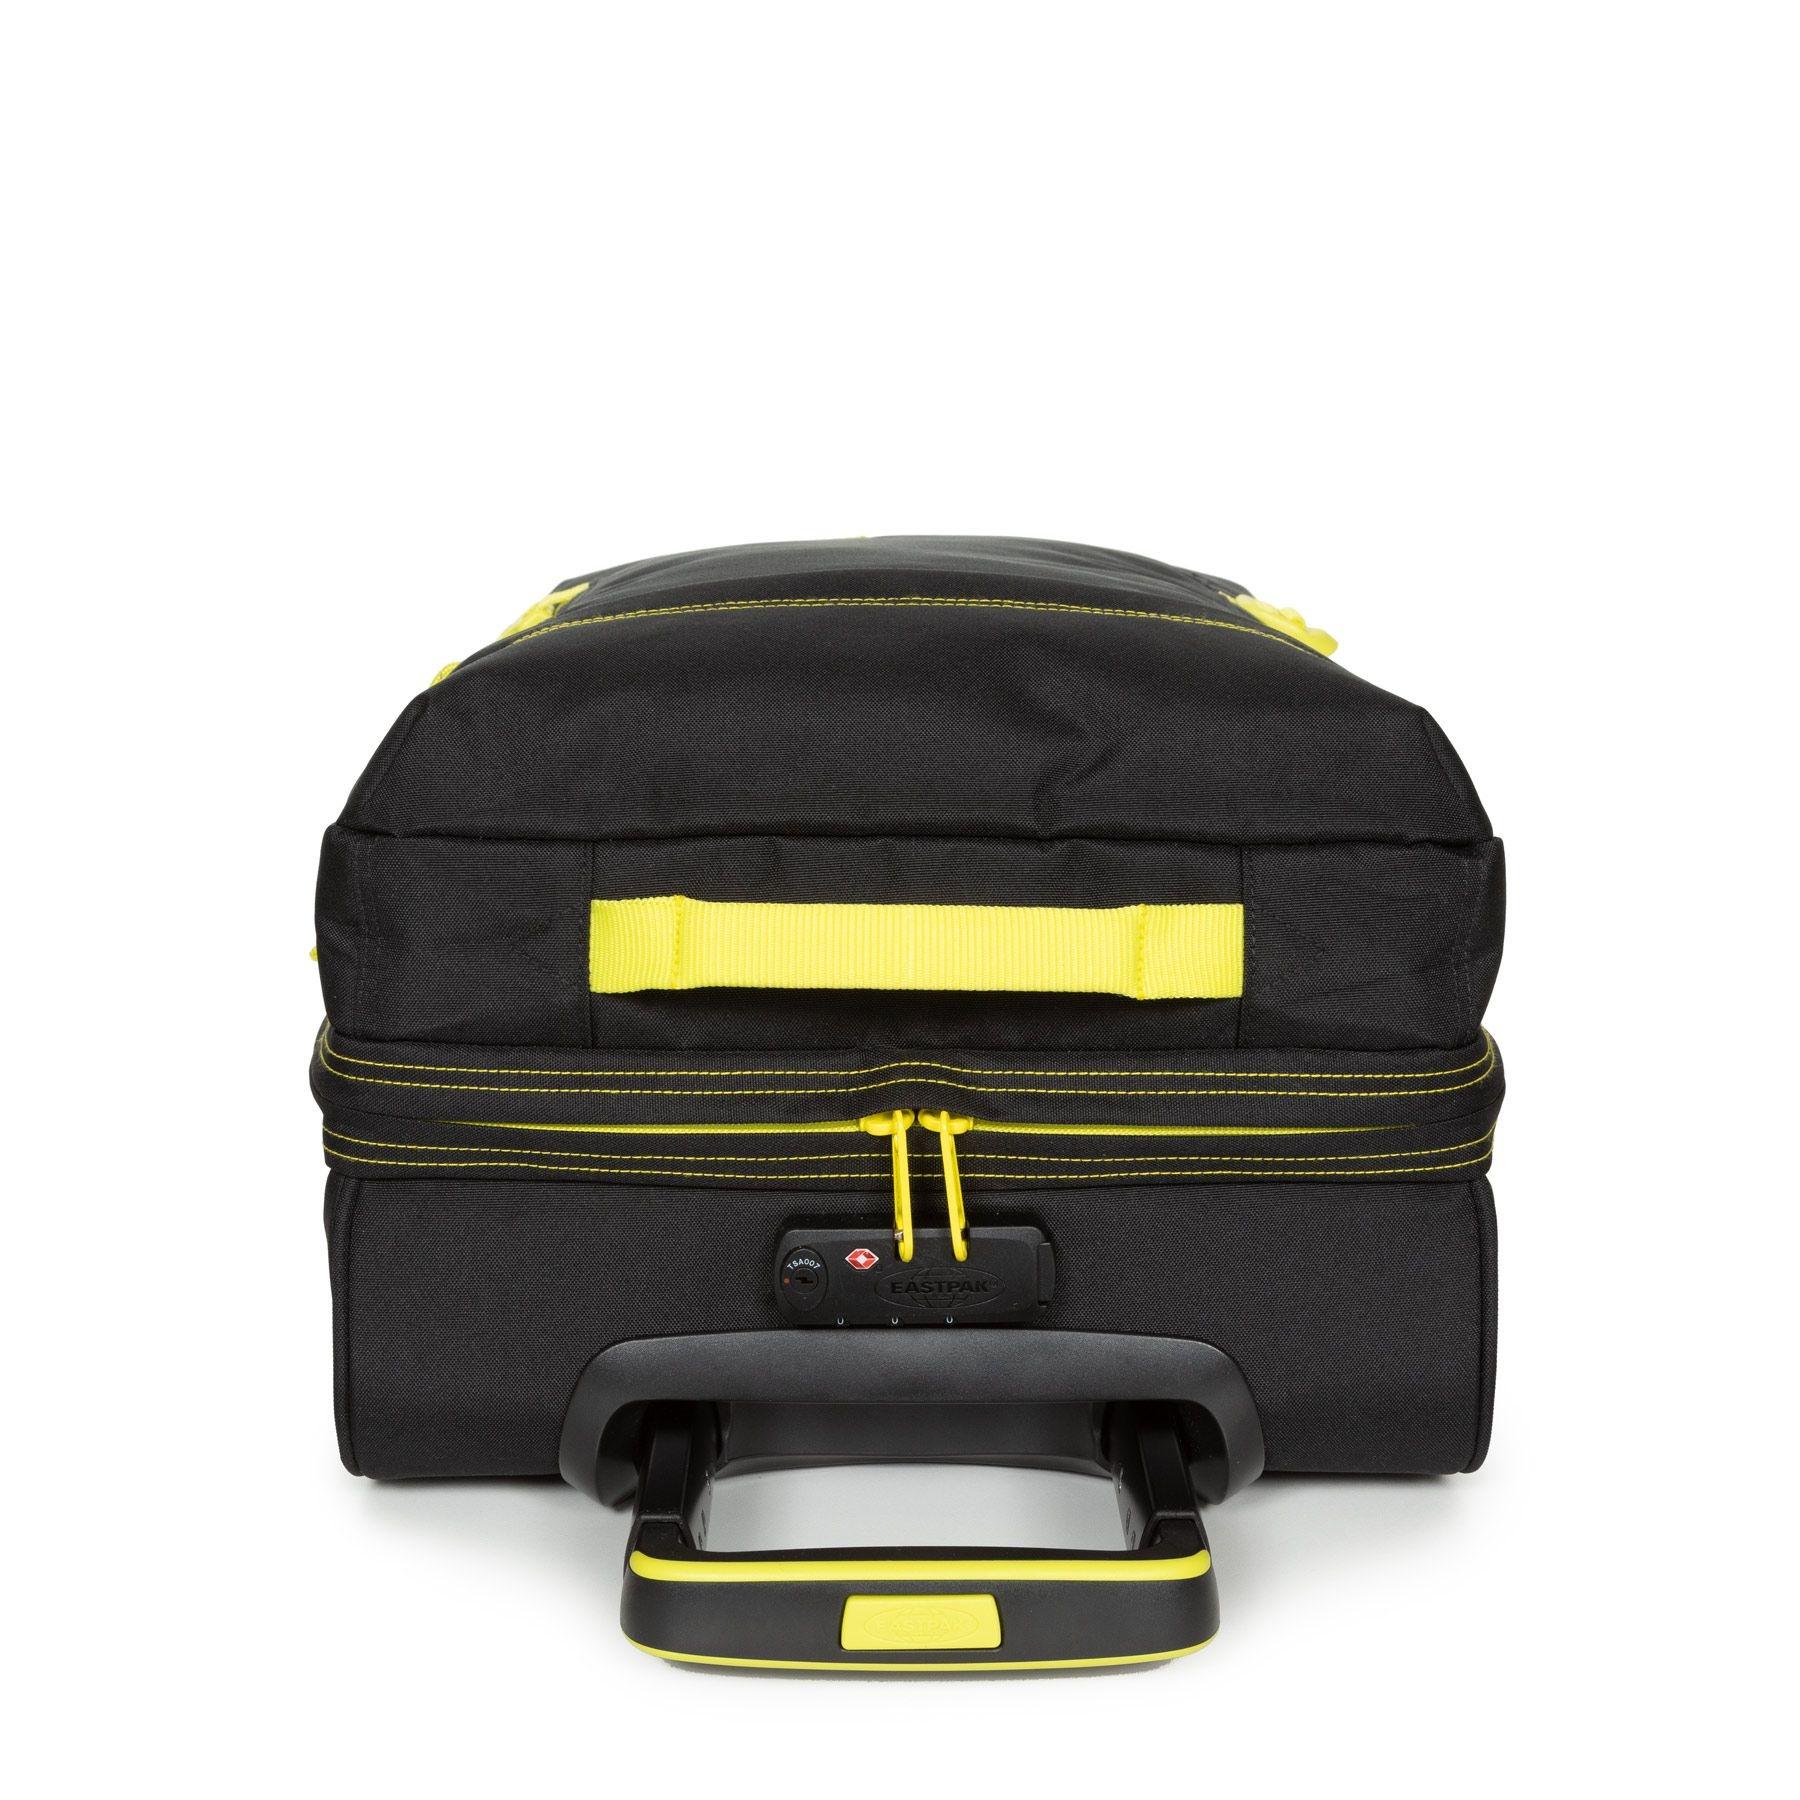 Eastpak Eastpak Tranverz S Kontrast Lime Handbagage reistas met trolley en wieltjes